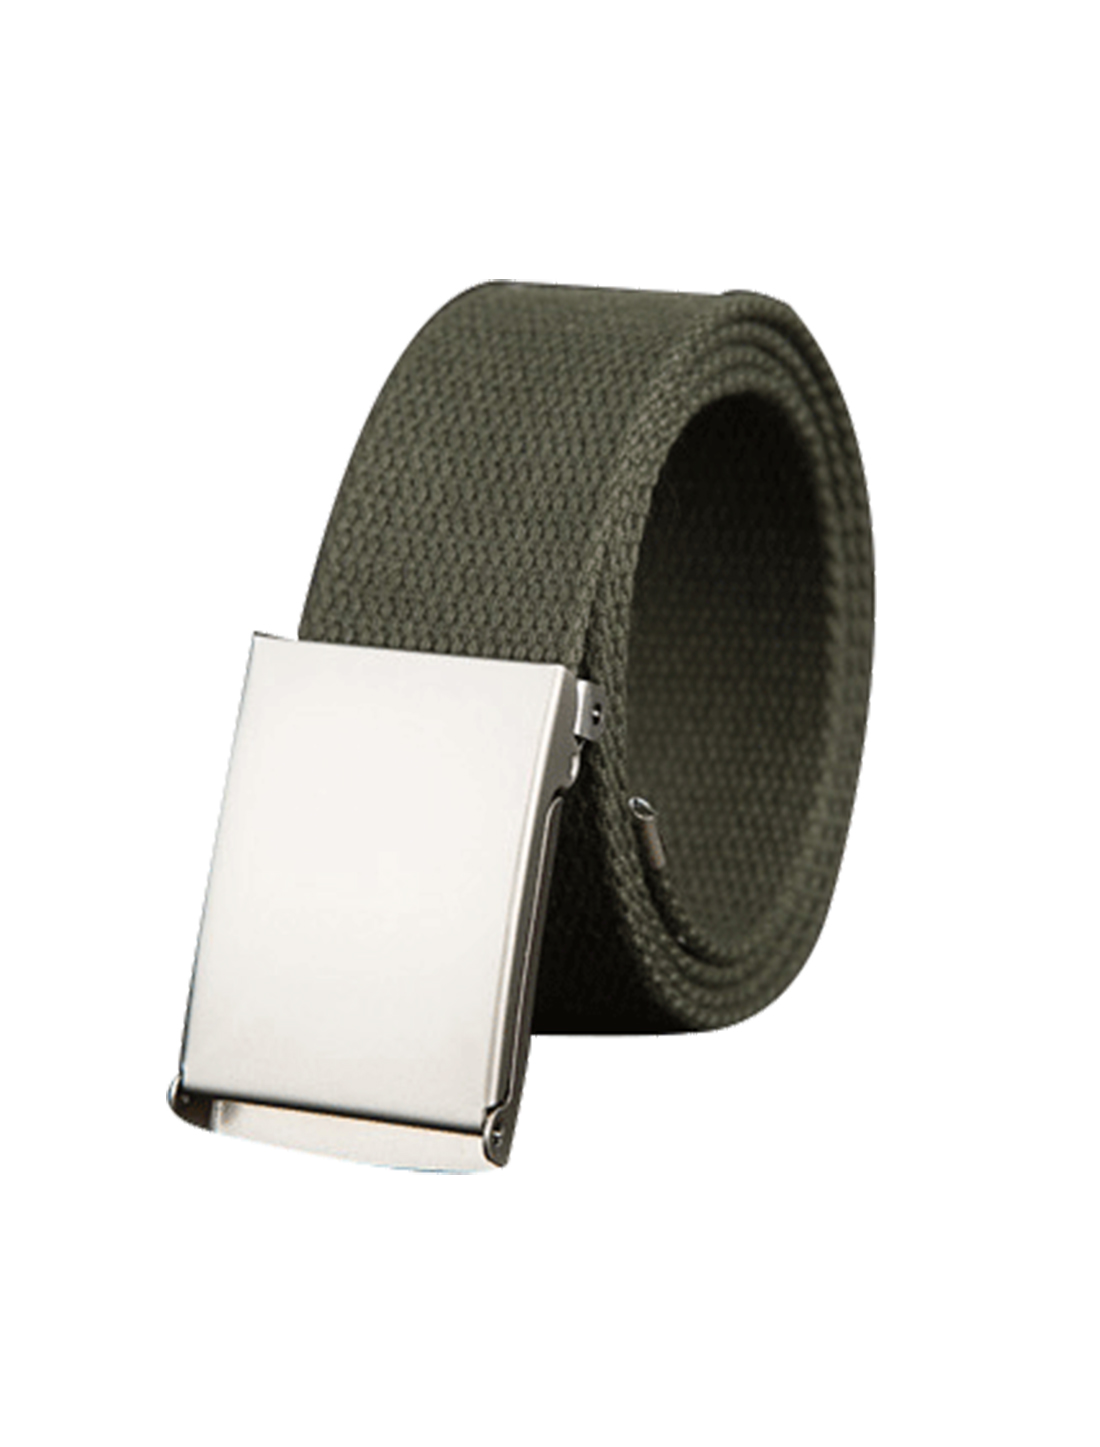 "Unisex Canvas No Hole Slide Metal Buckle Waist Belt Width 1 1/2"" Army Green"